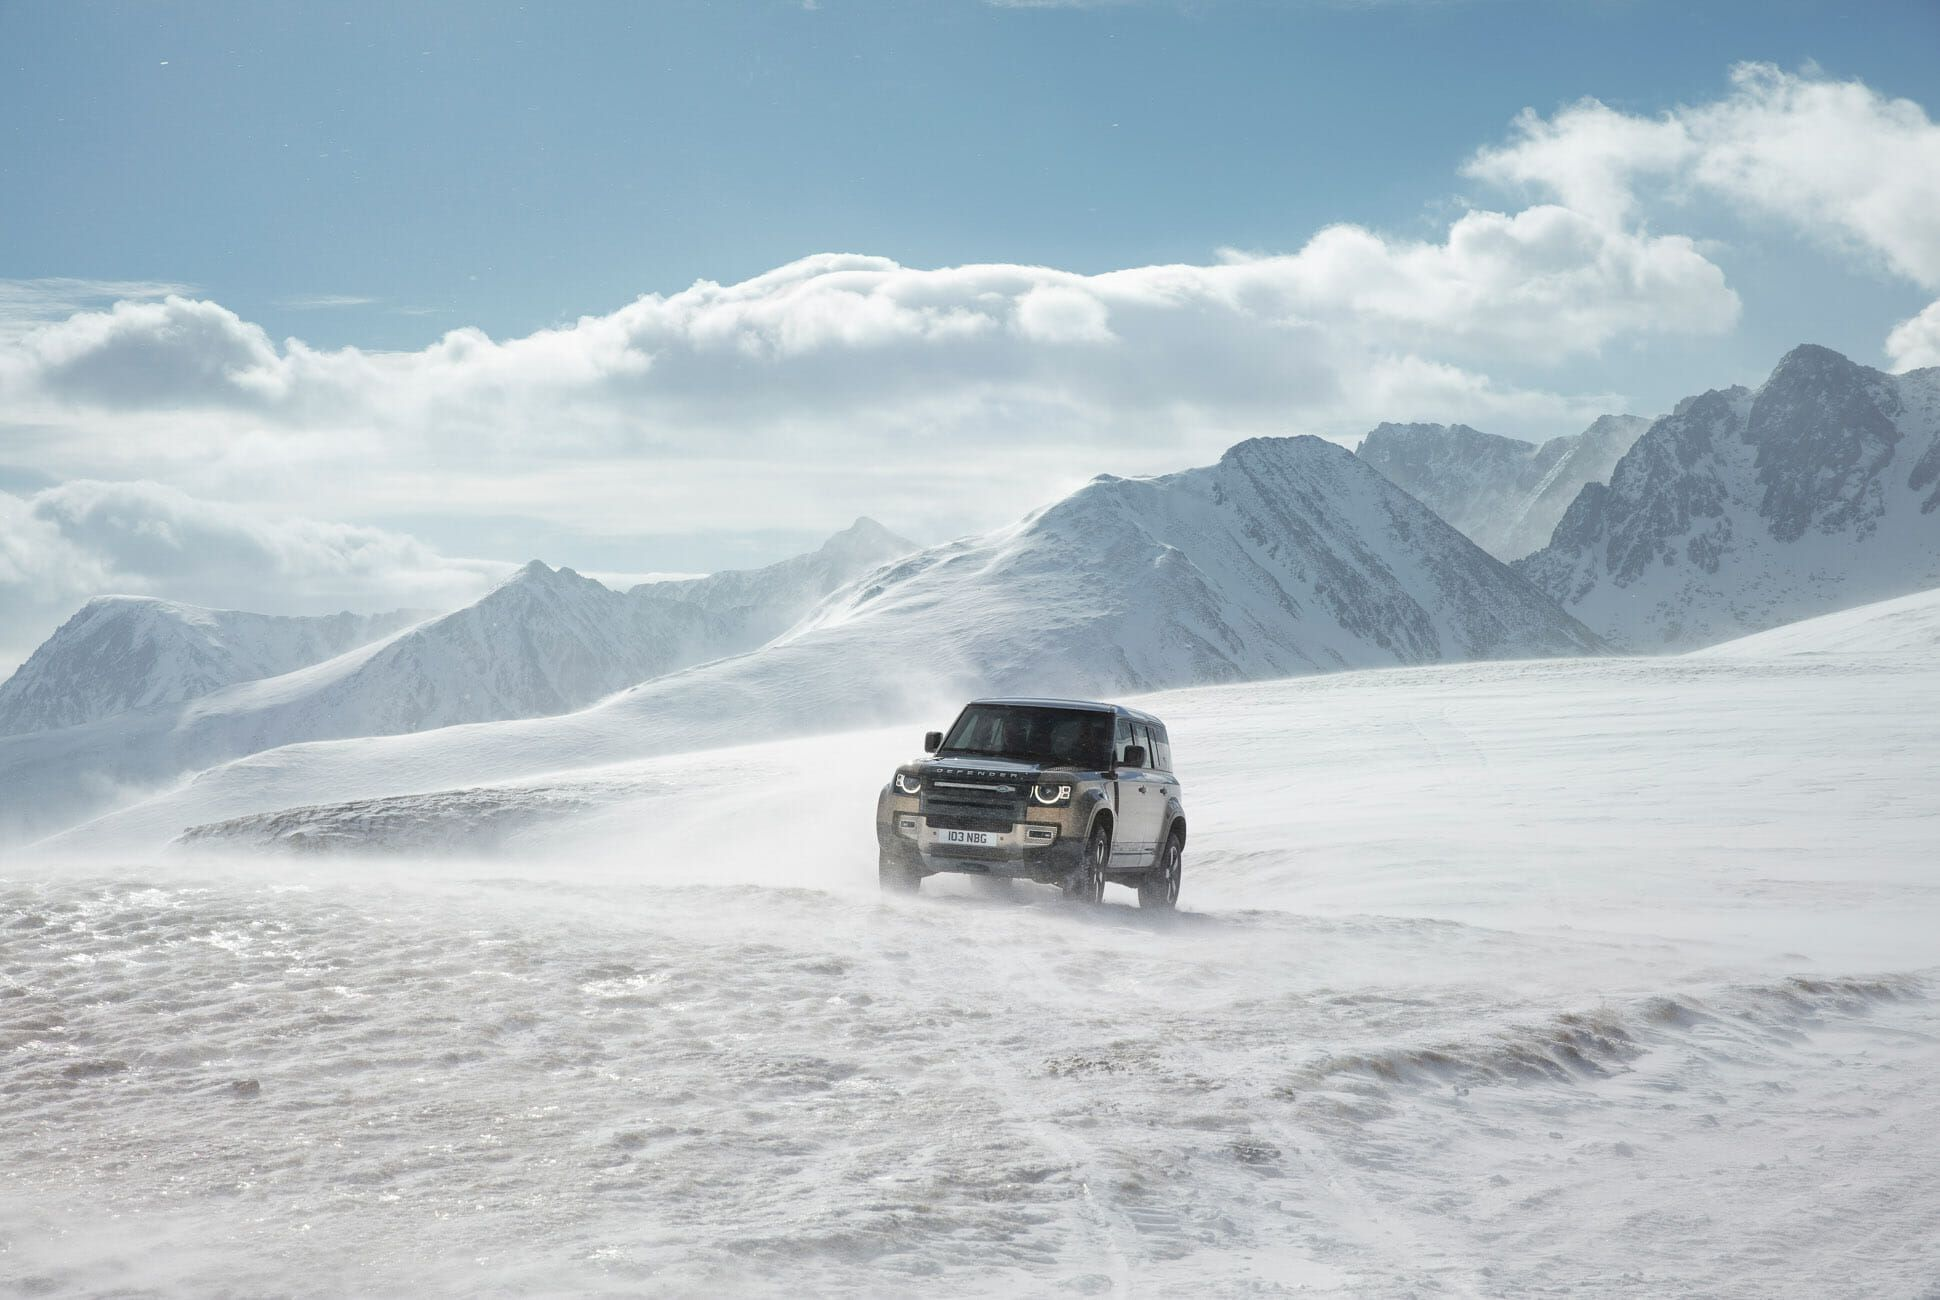 Land Rover Defender Gear Patrol-Exterior Action-Slide-26